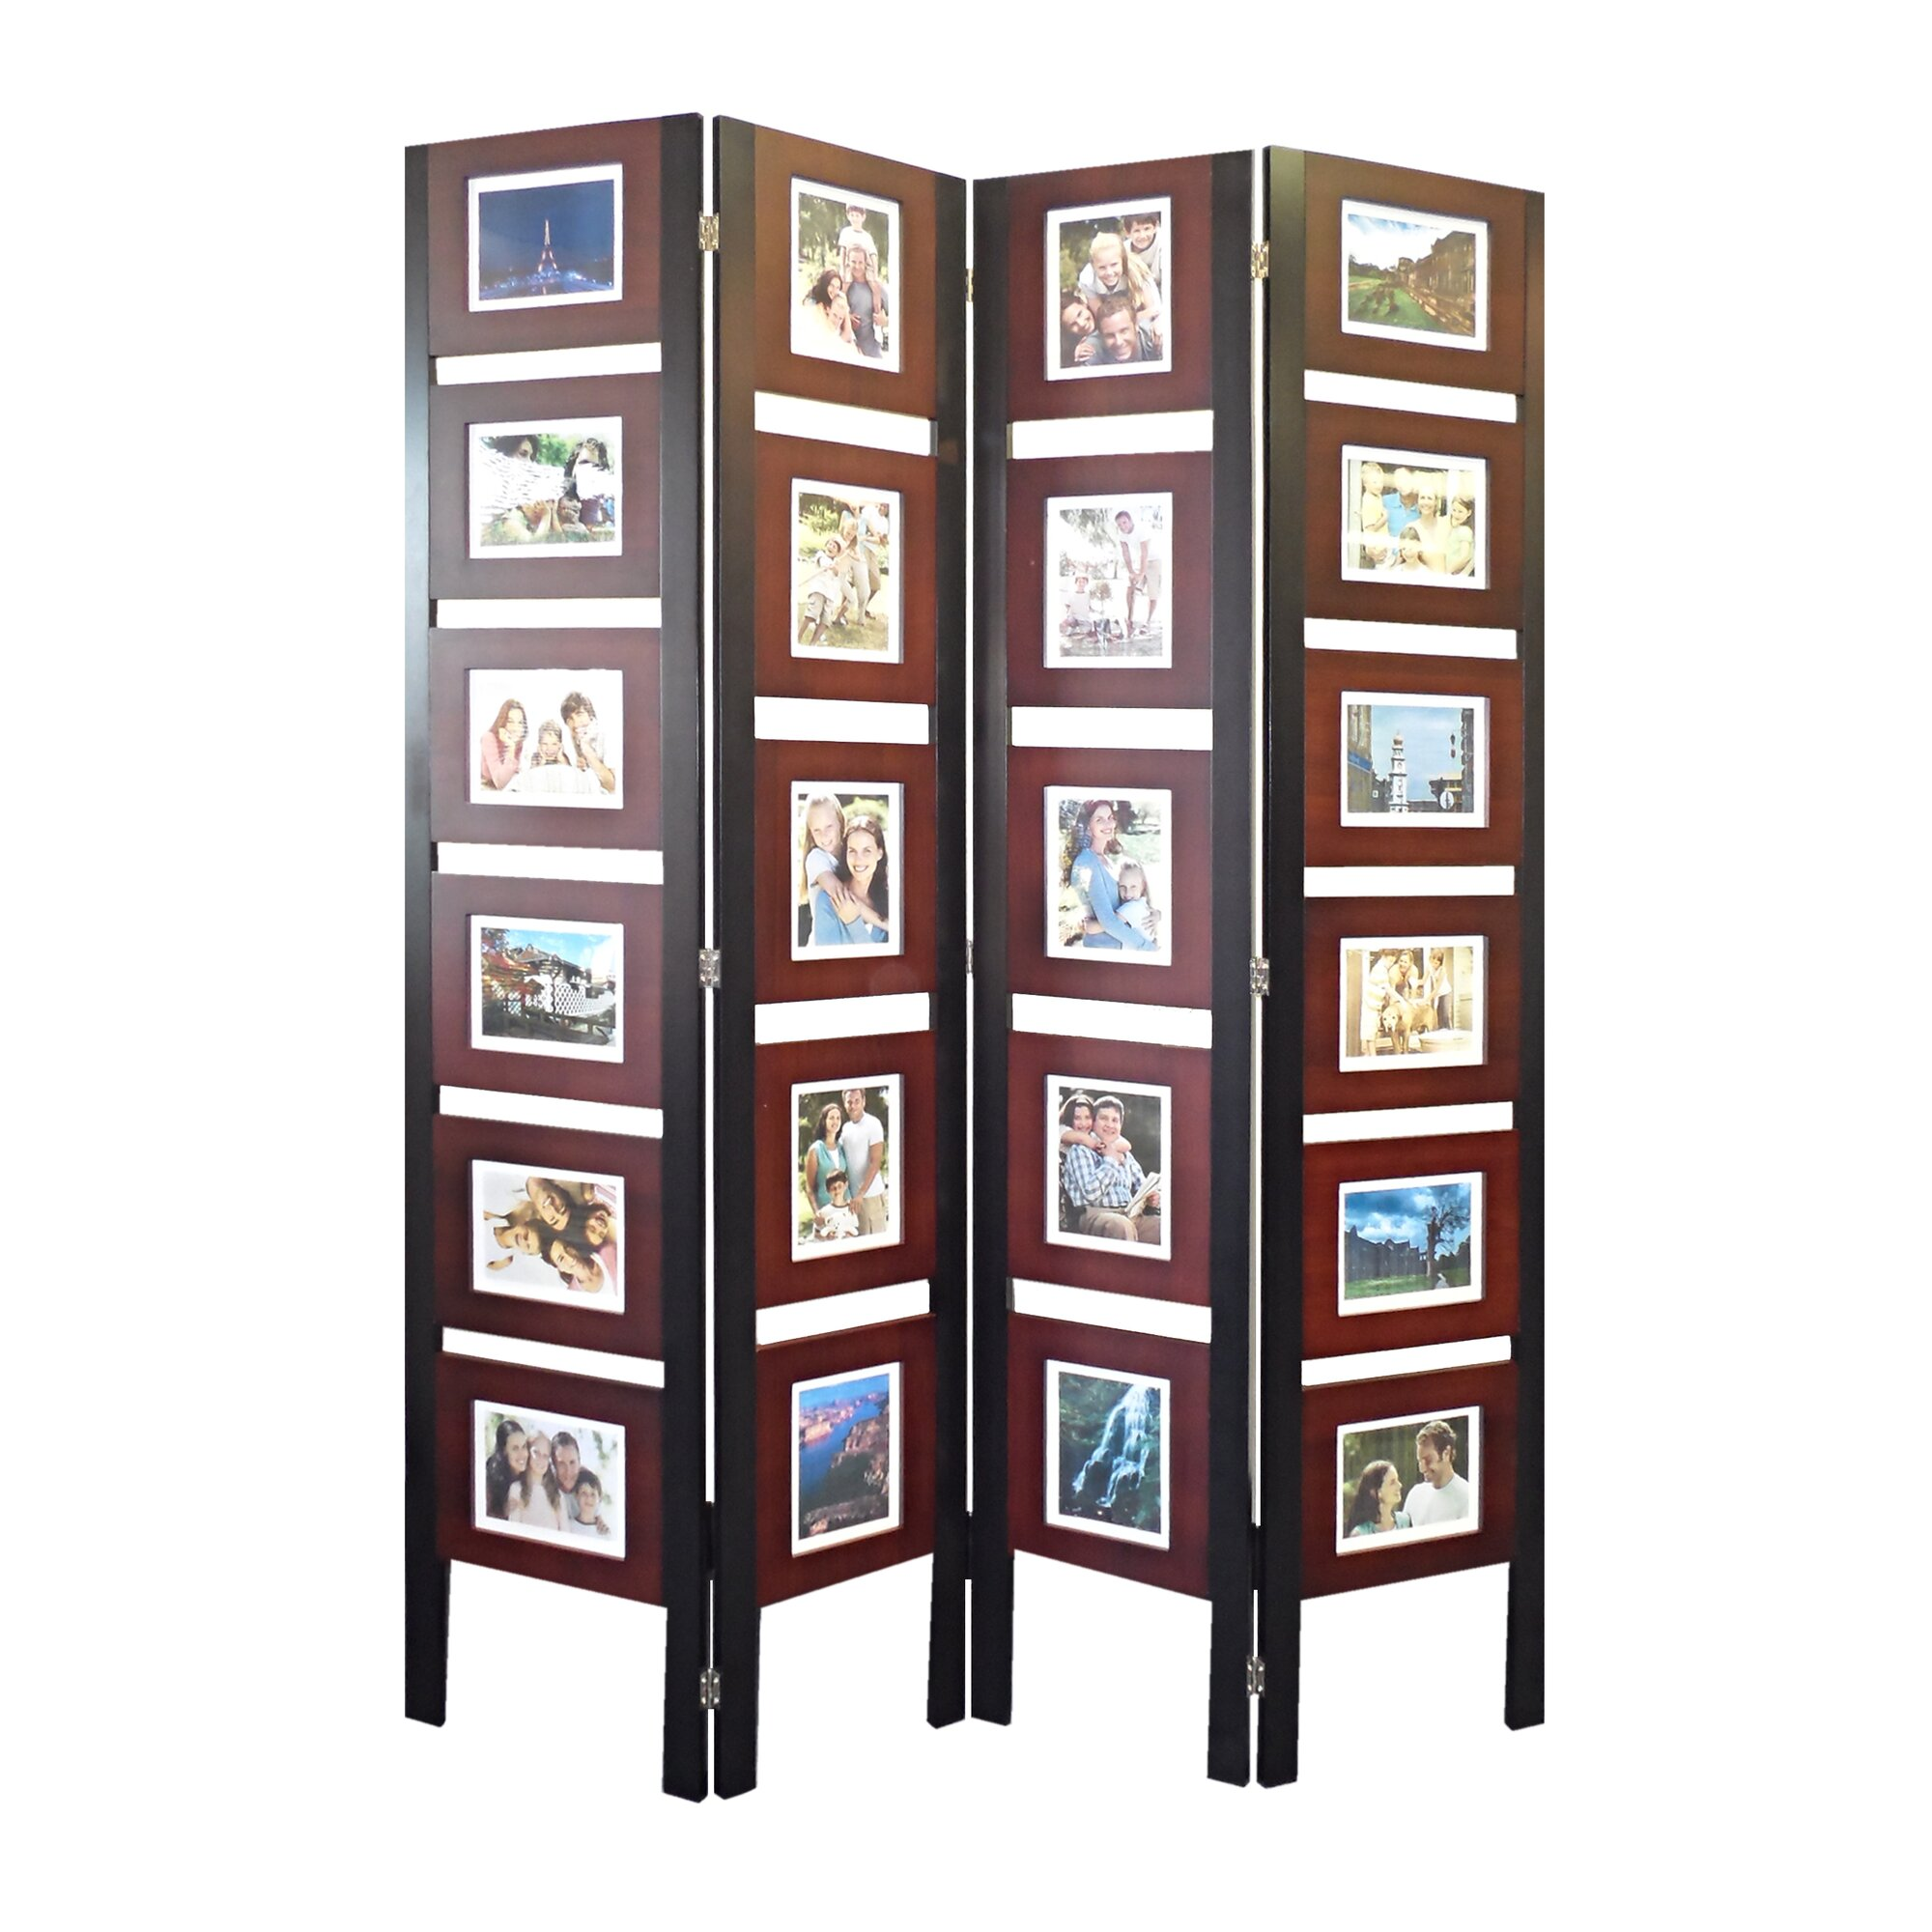 folding screen room divider proman x oscar picture folding screen panel room divider